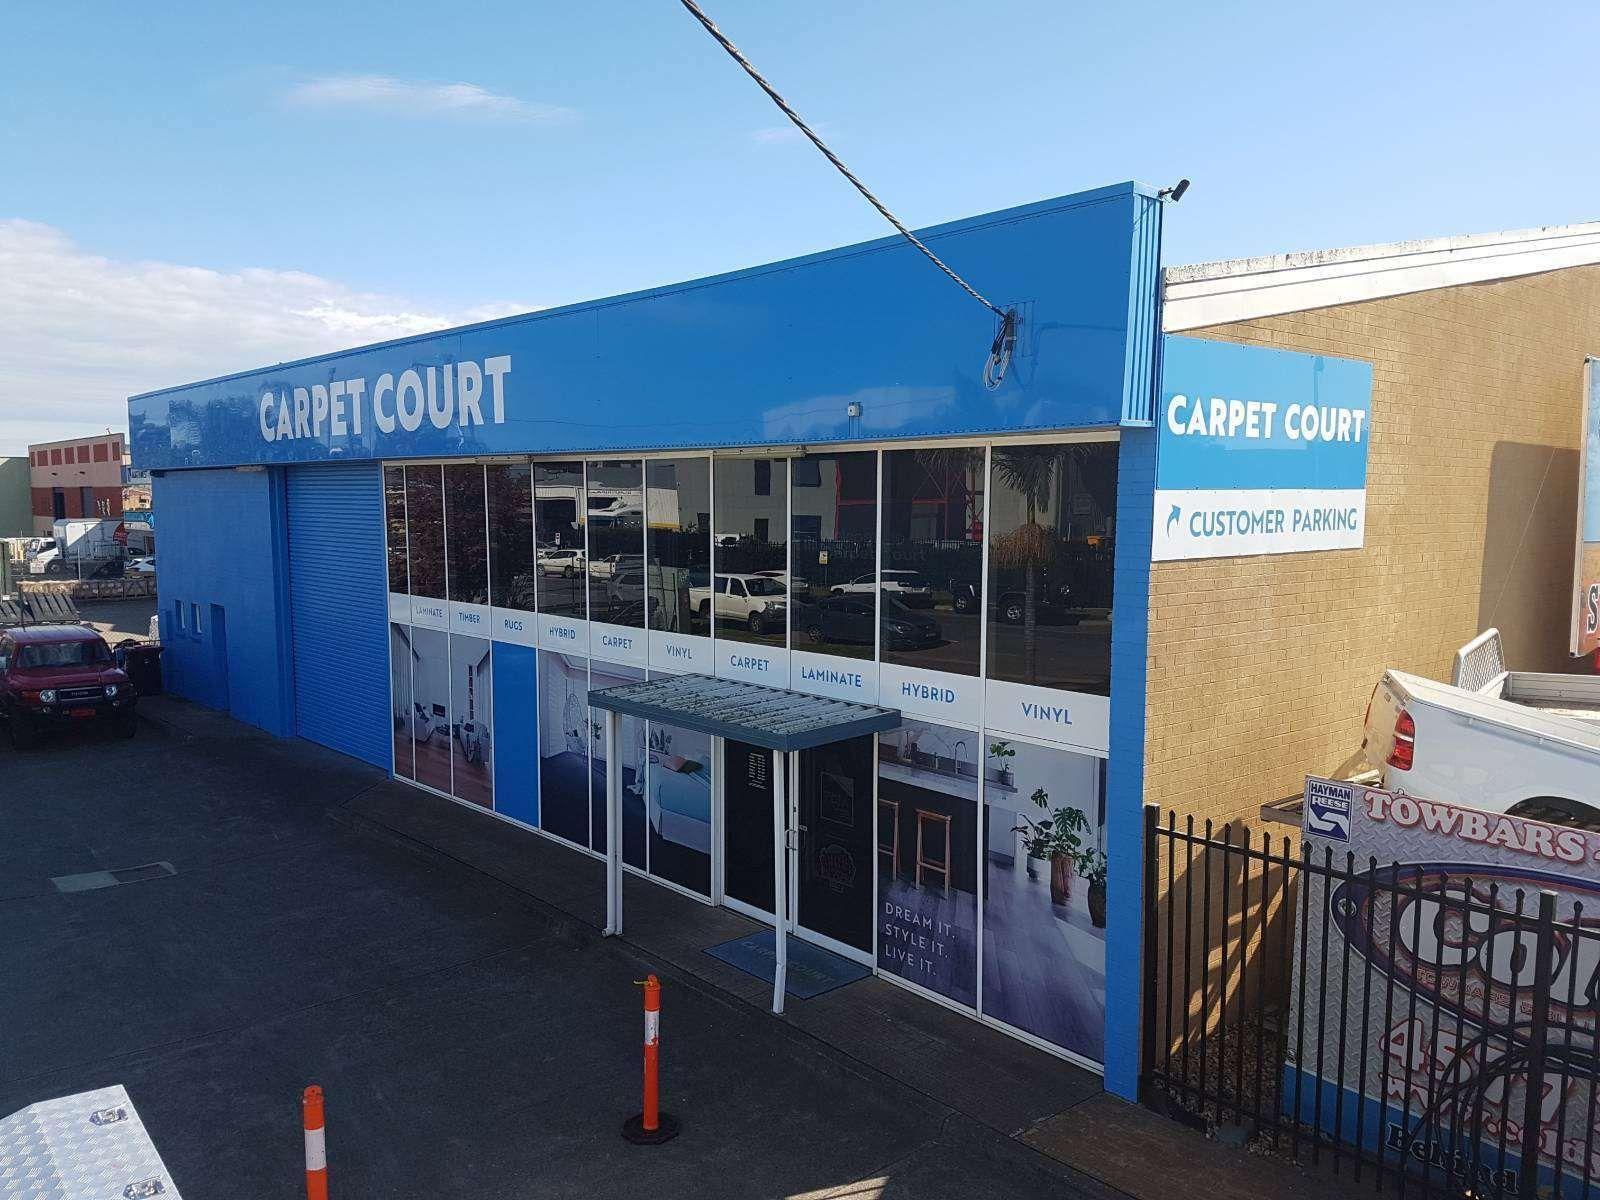 McGraths Hill Carpet Court